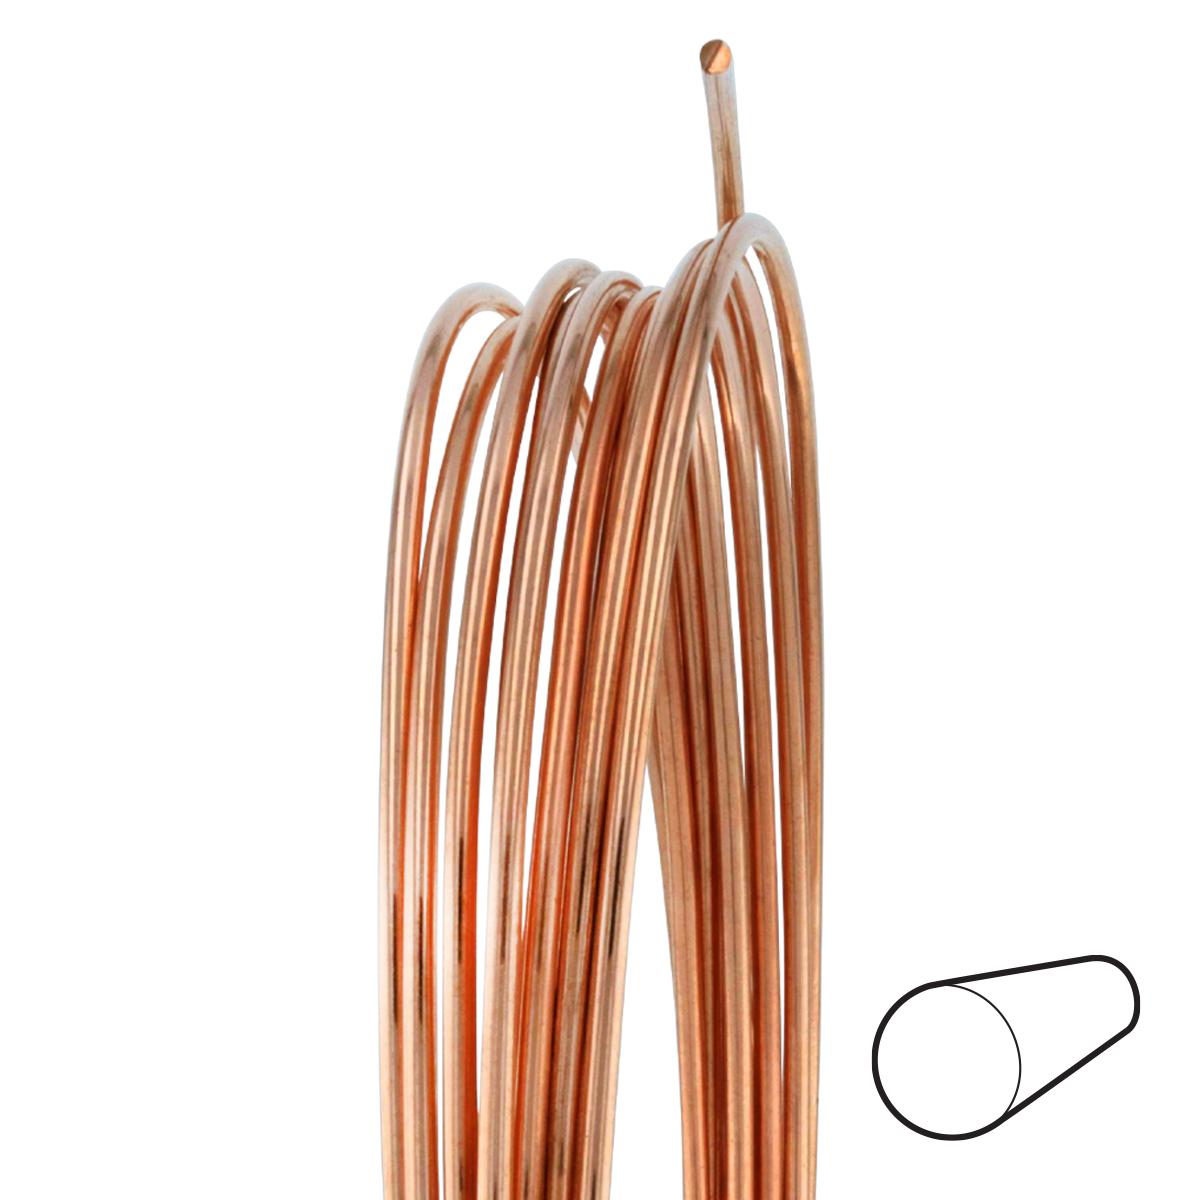 26 gauge round half hard copper wire wire jewelry wire wrap 26 gauge round half hard copper wire keyboard keysfo Choice Image